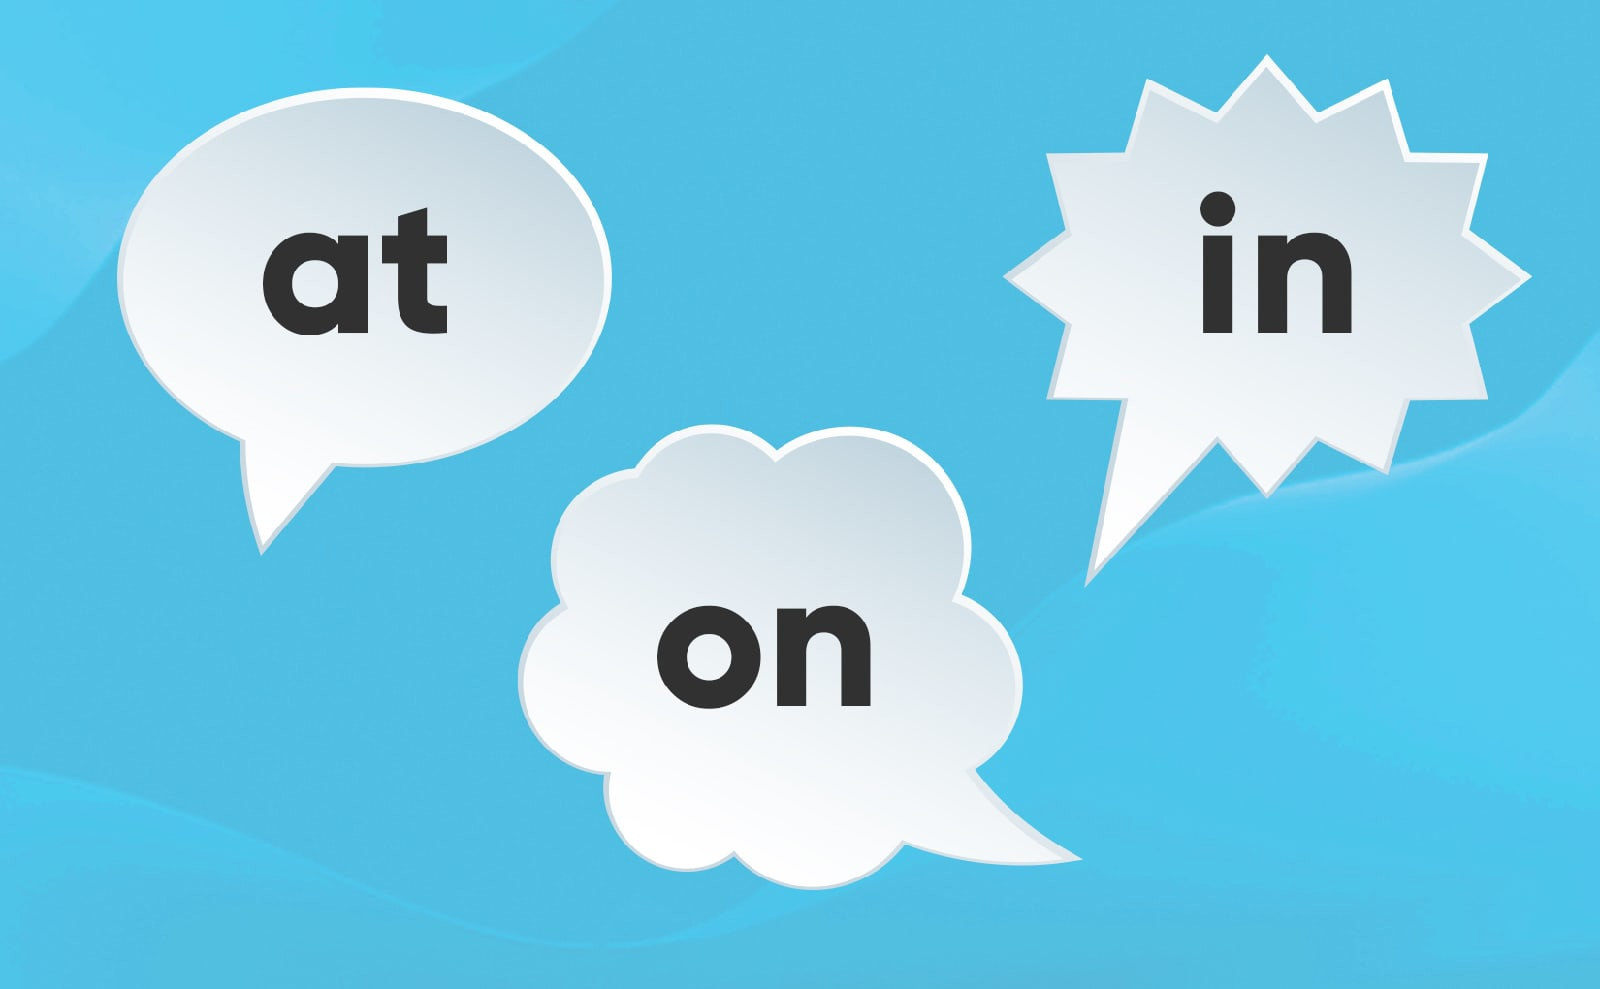 предлоги места и времени, how to use prepositions, упражнения на предлоги места и времени